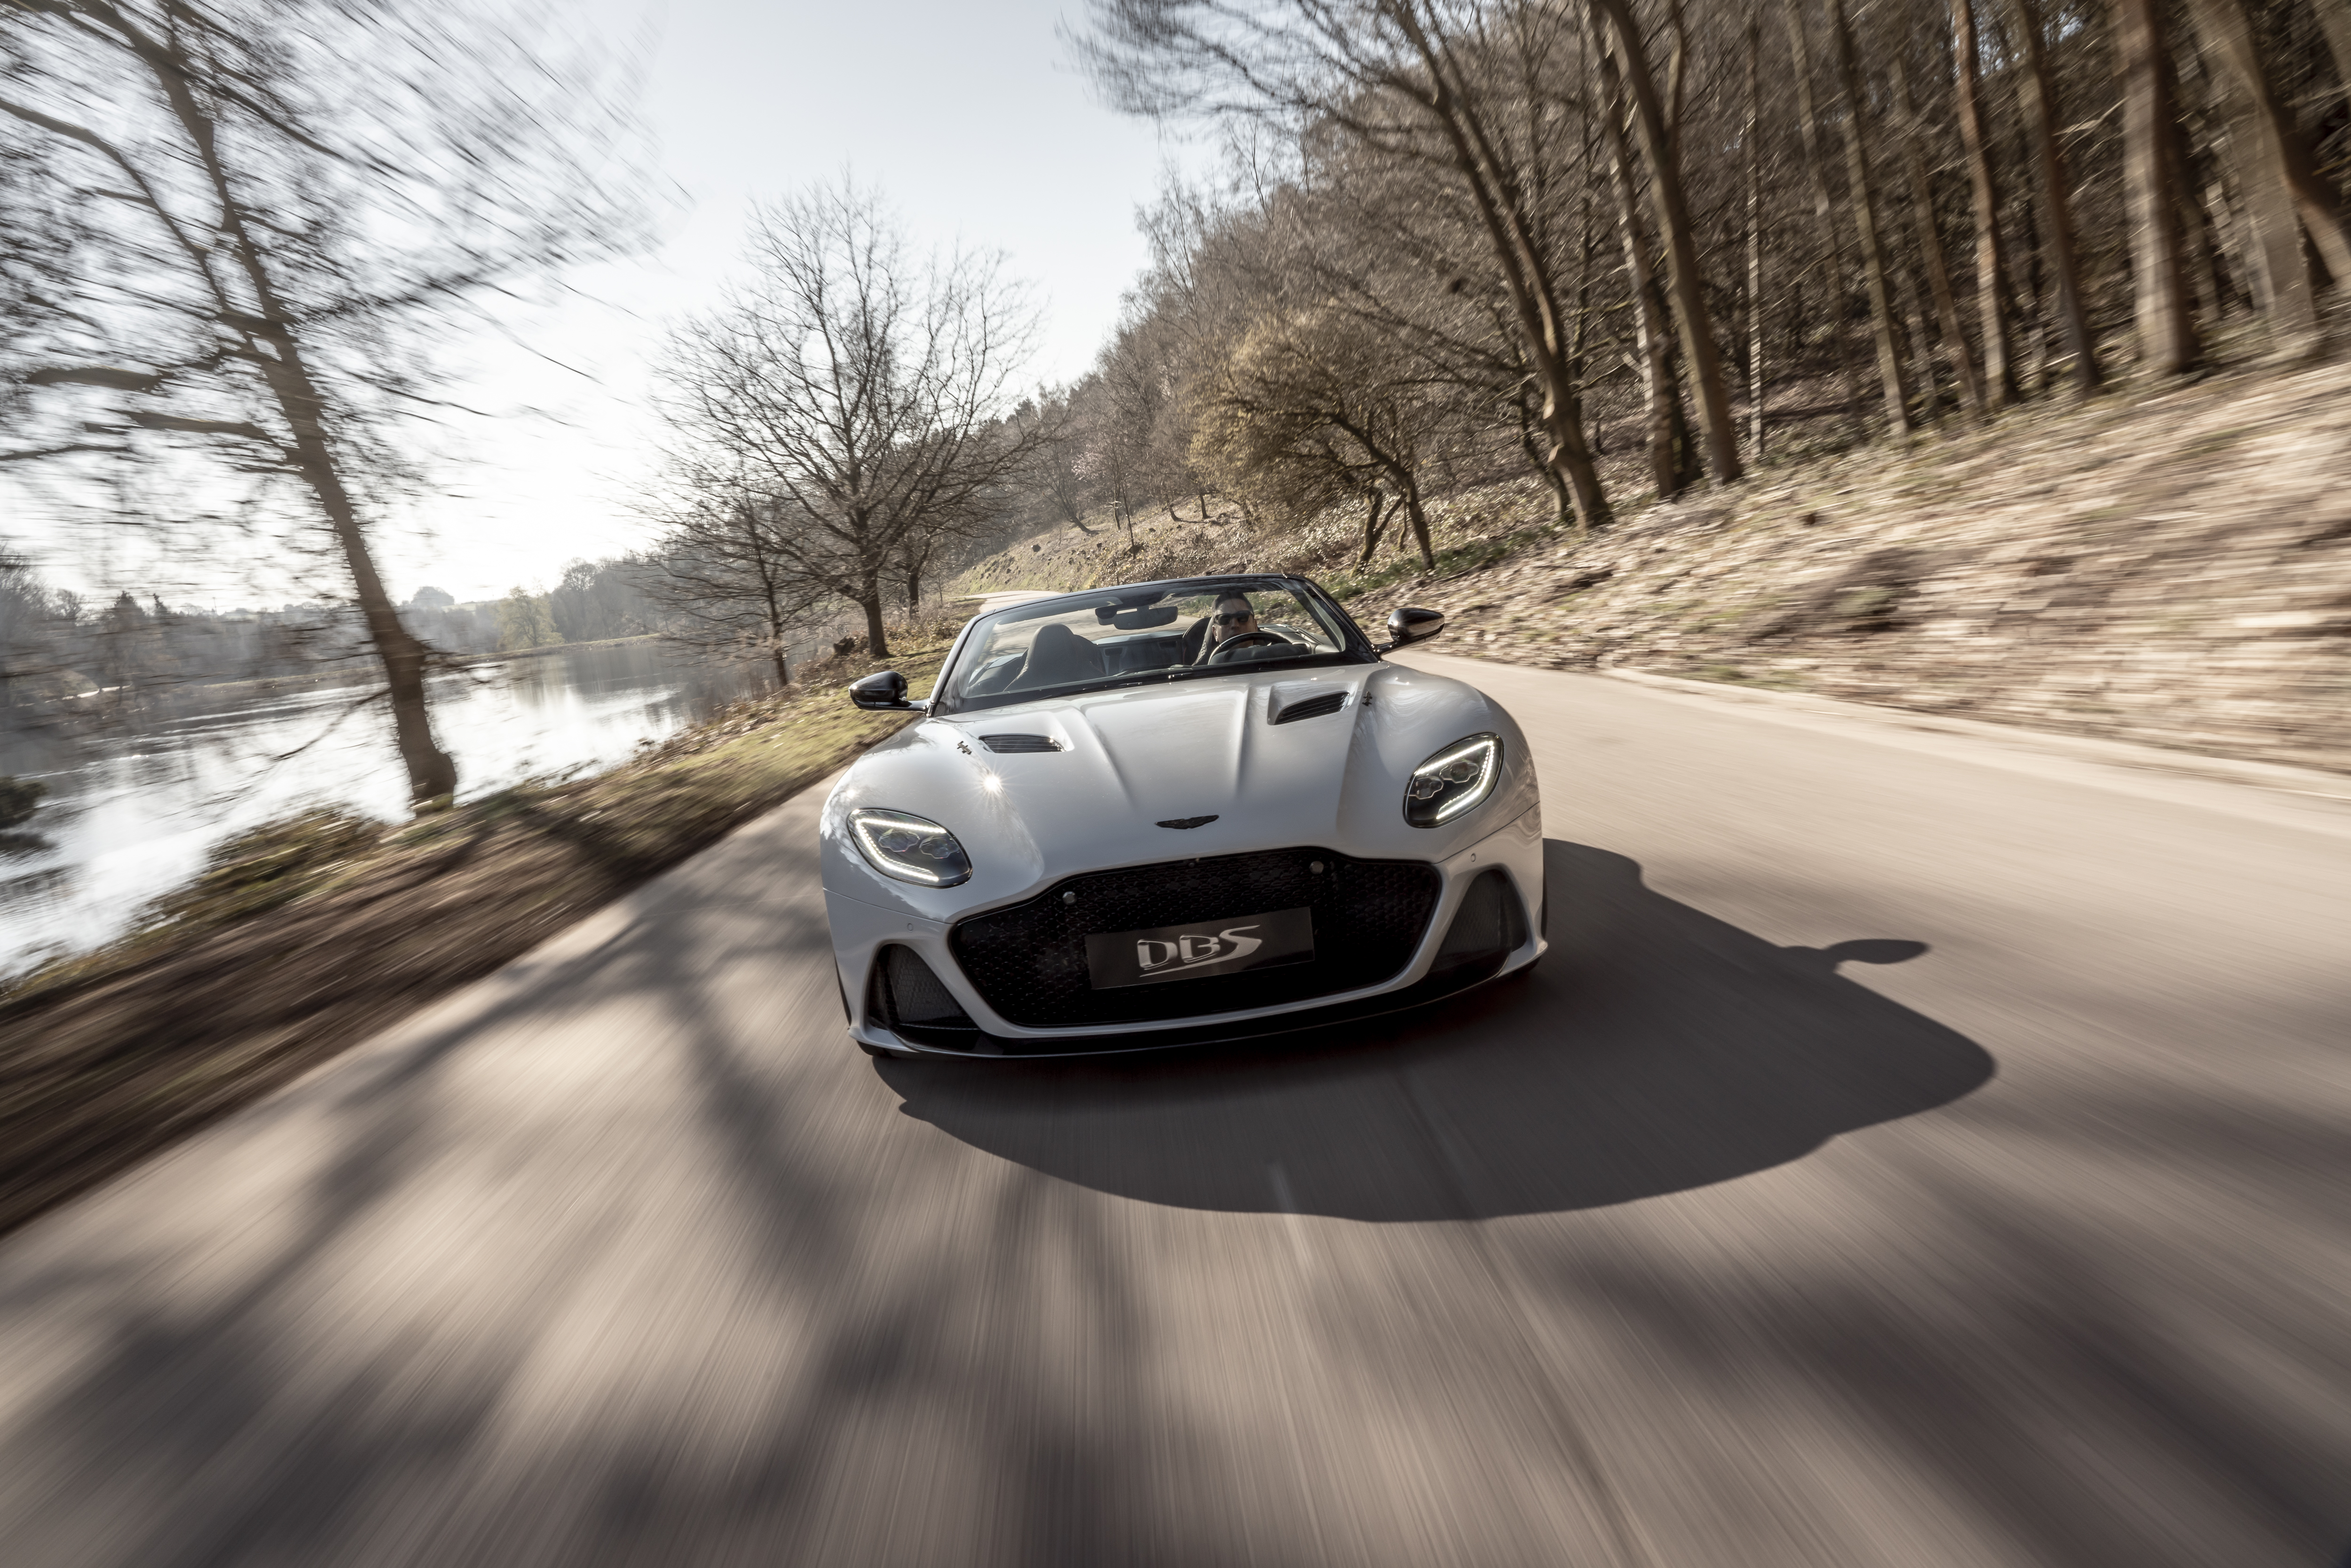 Aston Martin Dbs Superleggera 4k Ultra Hd Wallpaper Background Image 5000x3335 Id 1010329 Wallpaper Abyss